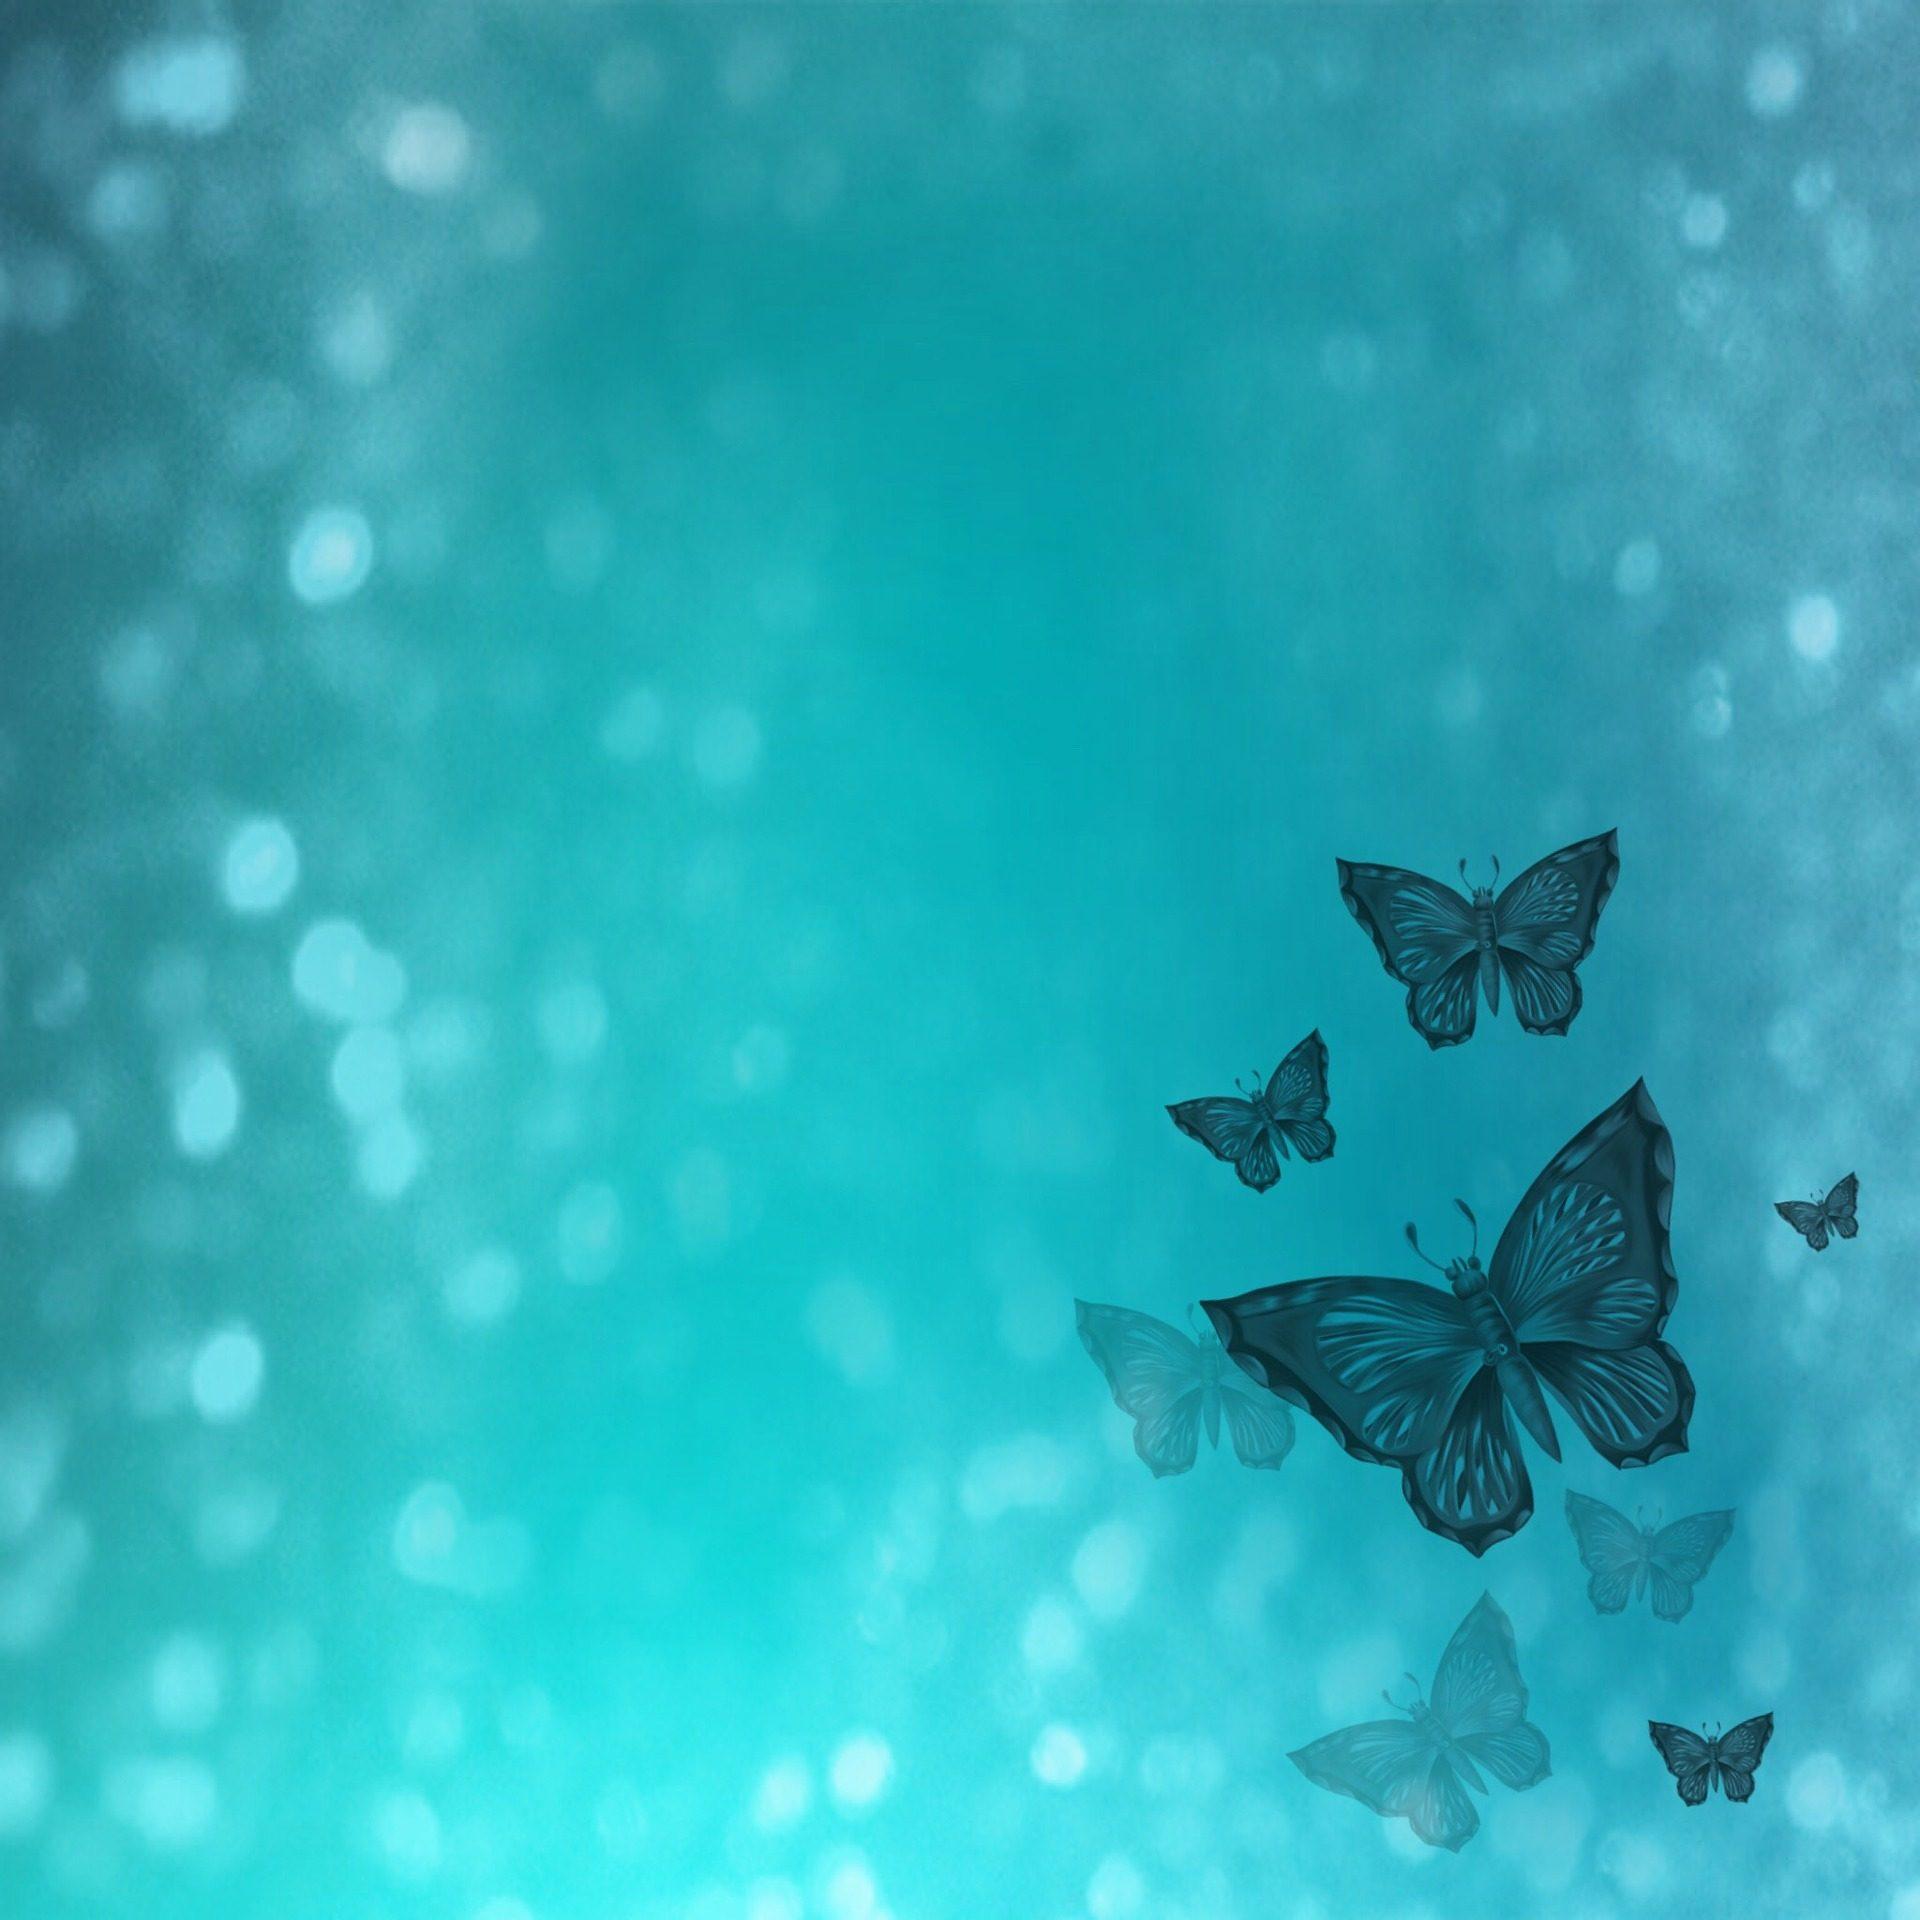 luces, halos, formas, mariposas, turquesa, 1710171054